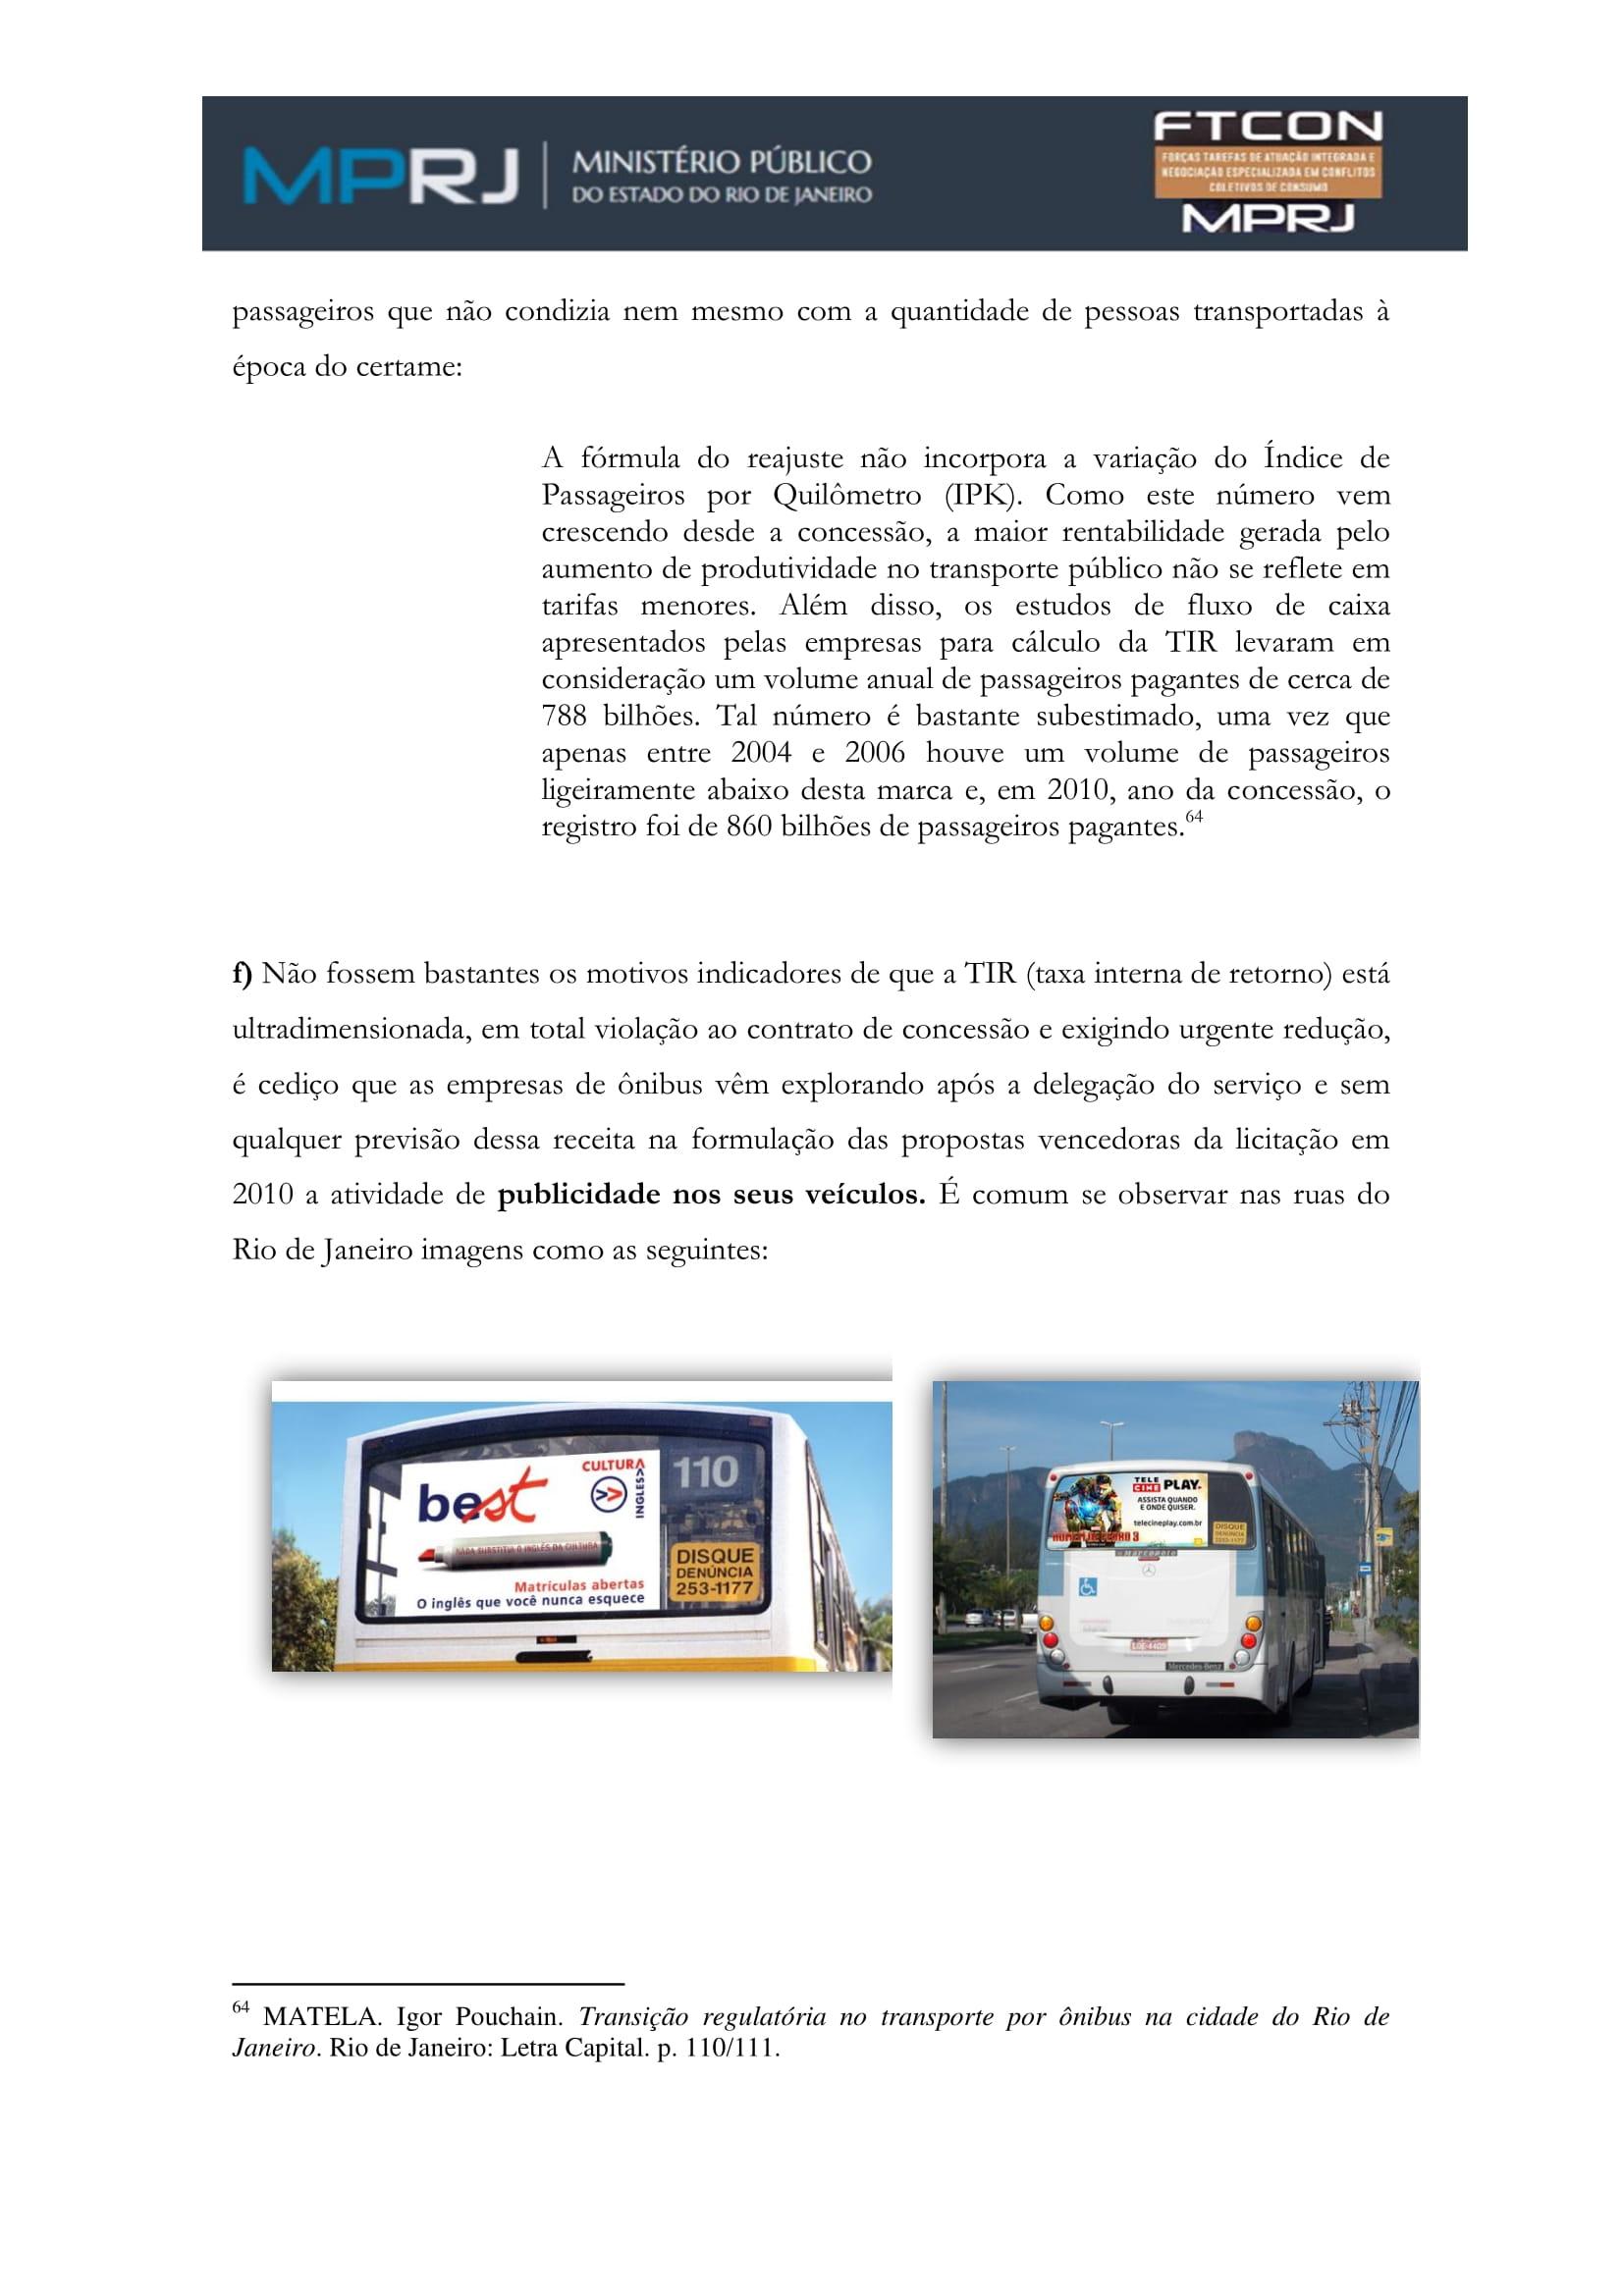 acp_caducidade_onibus_dr_rt-077